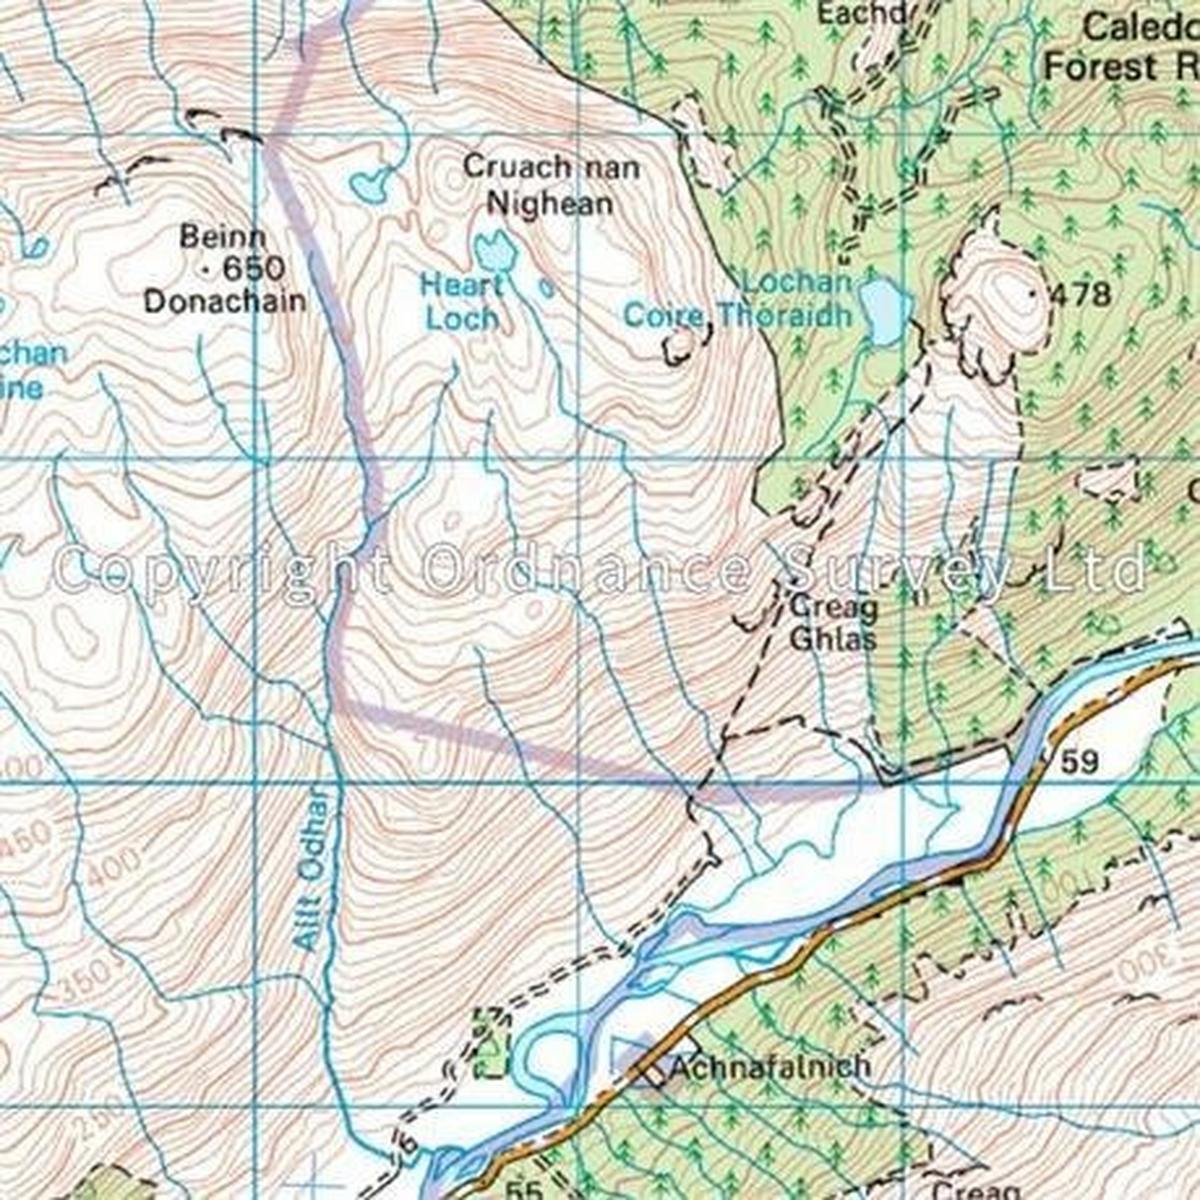 Ordnance Survey OS Landranger Map 50 Glen Orchy & Loch Etive